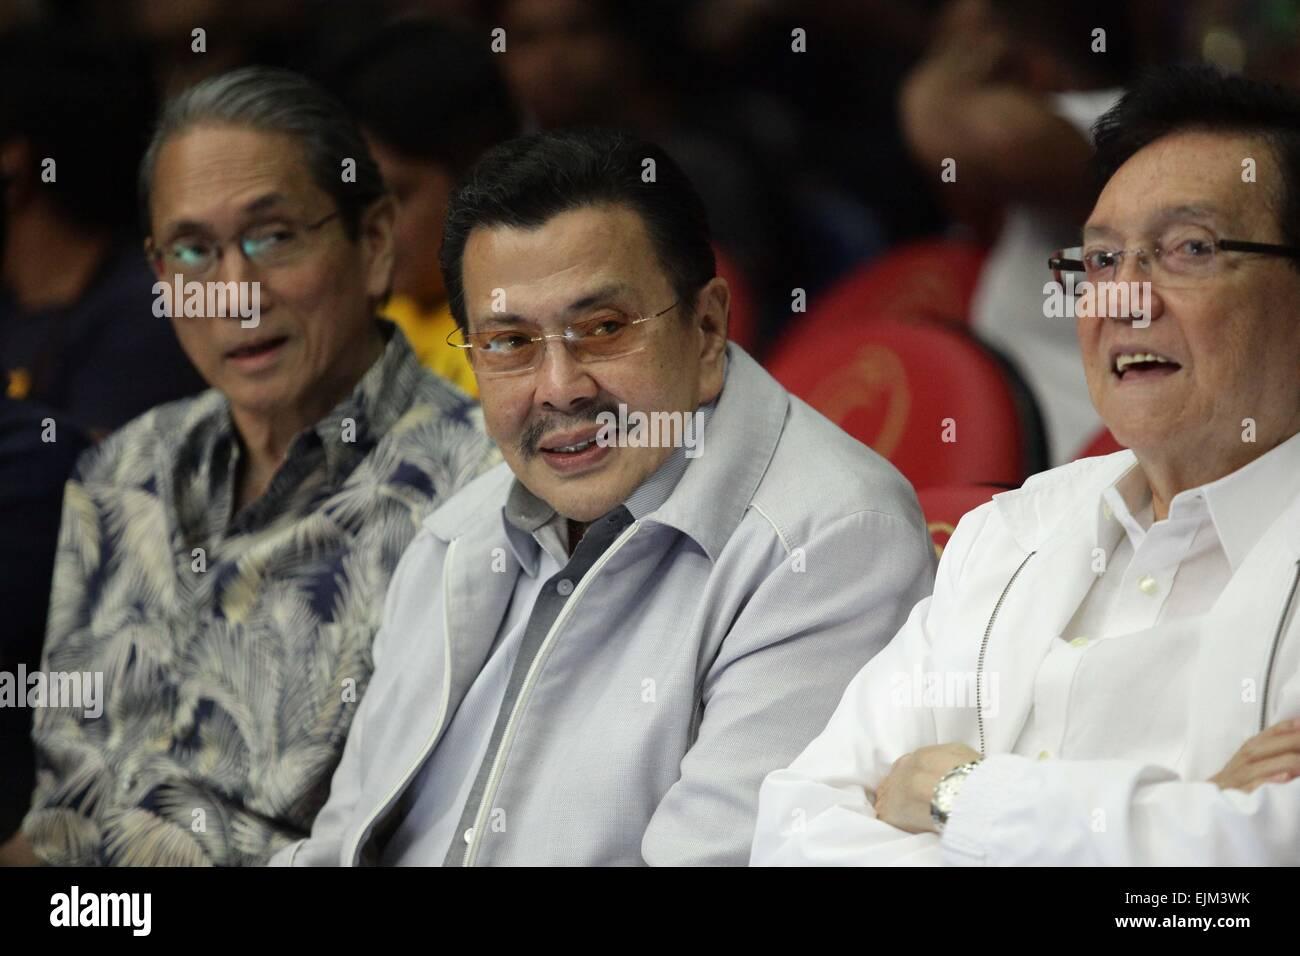 Manila, Filippine. 28 Mar, 2015. Manila Mayor Joseph Estrada (C) assiste il pugilato evento all'ARANETA COLISEUM Immagini Stock